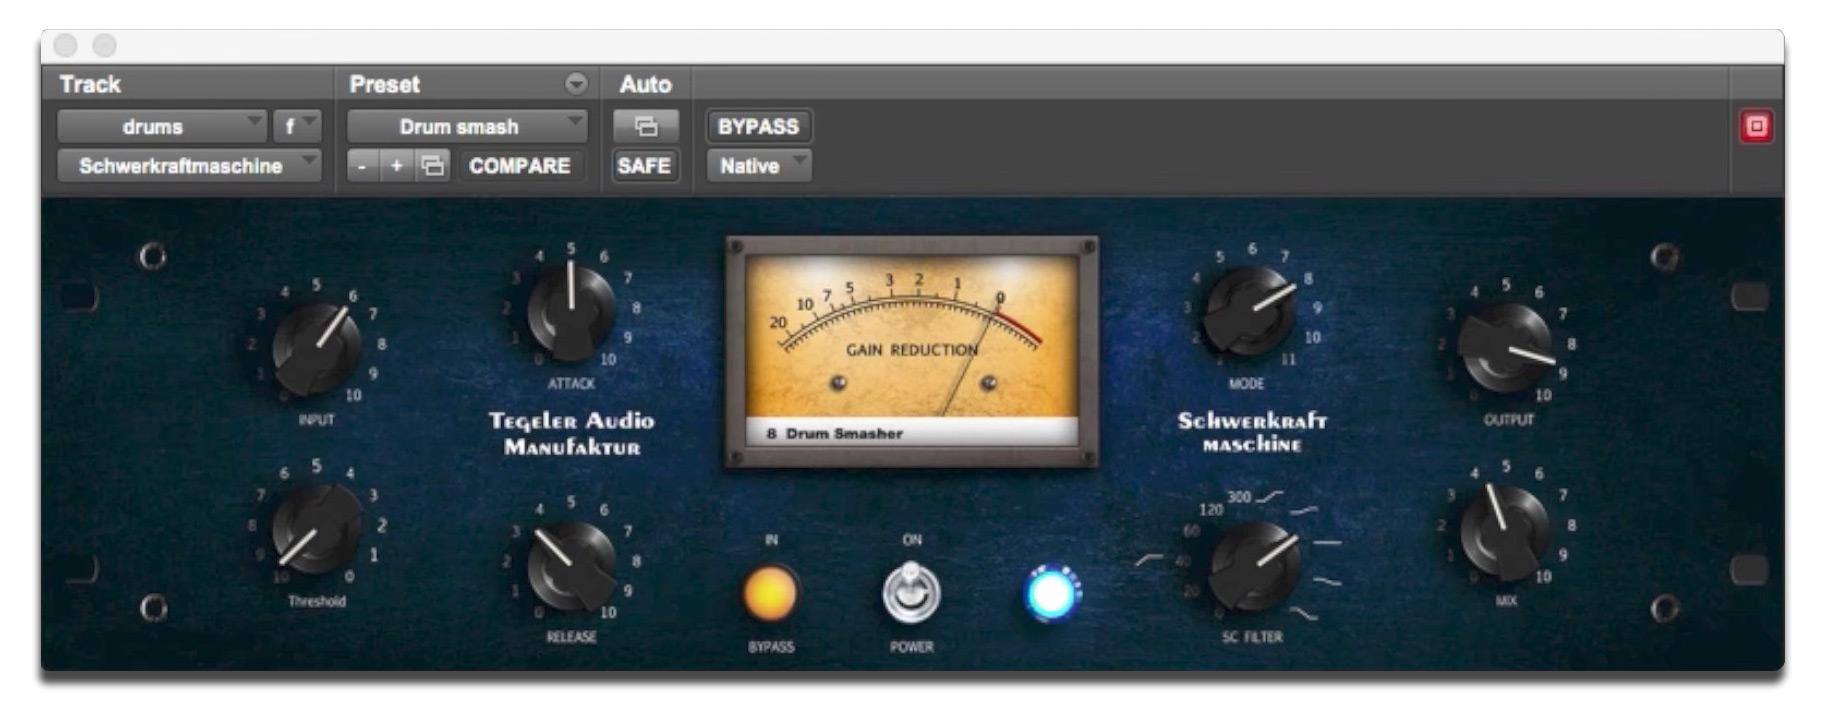 free-plug-in-Tegeler-Audio-Manufaktur-Schwerkraft-Mashine.jpg